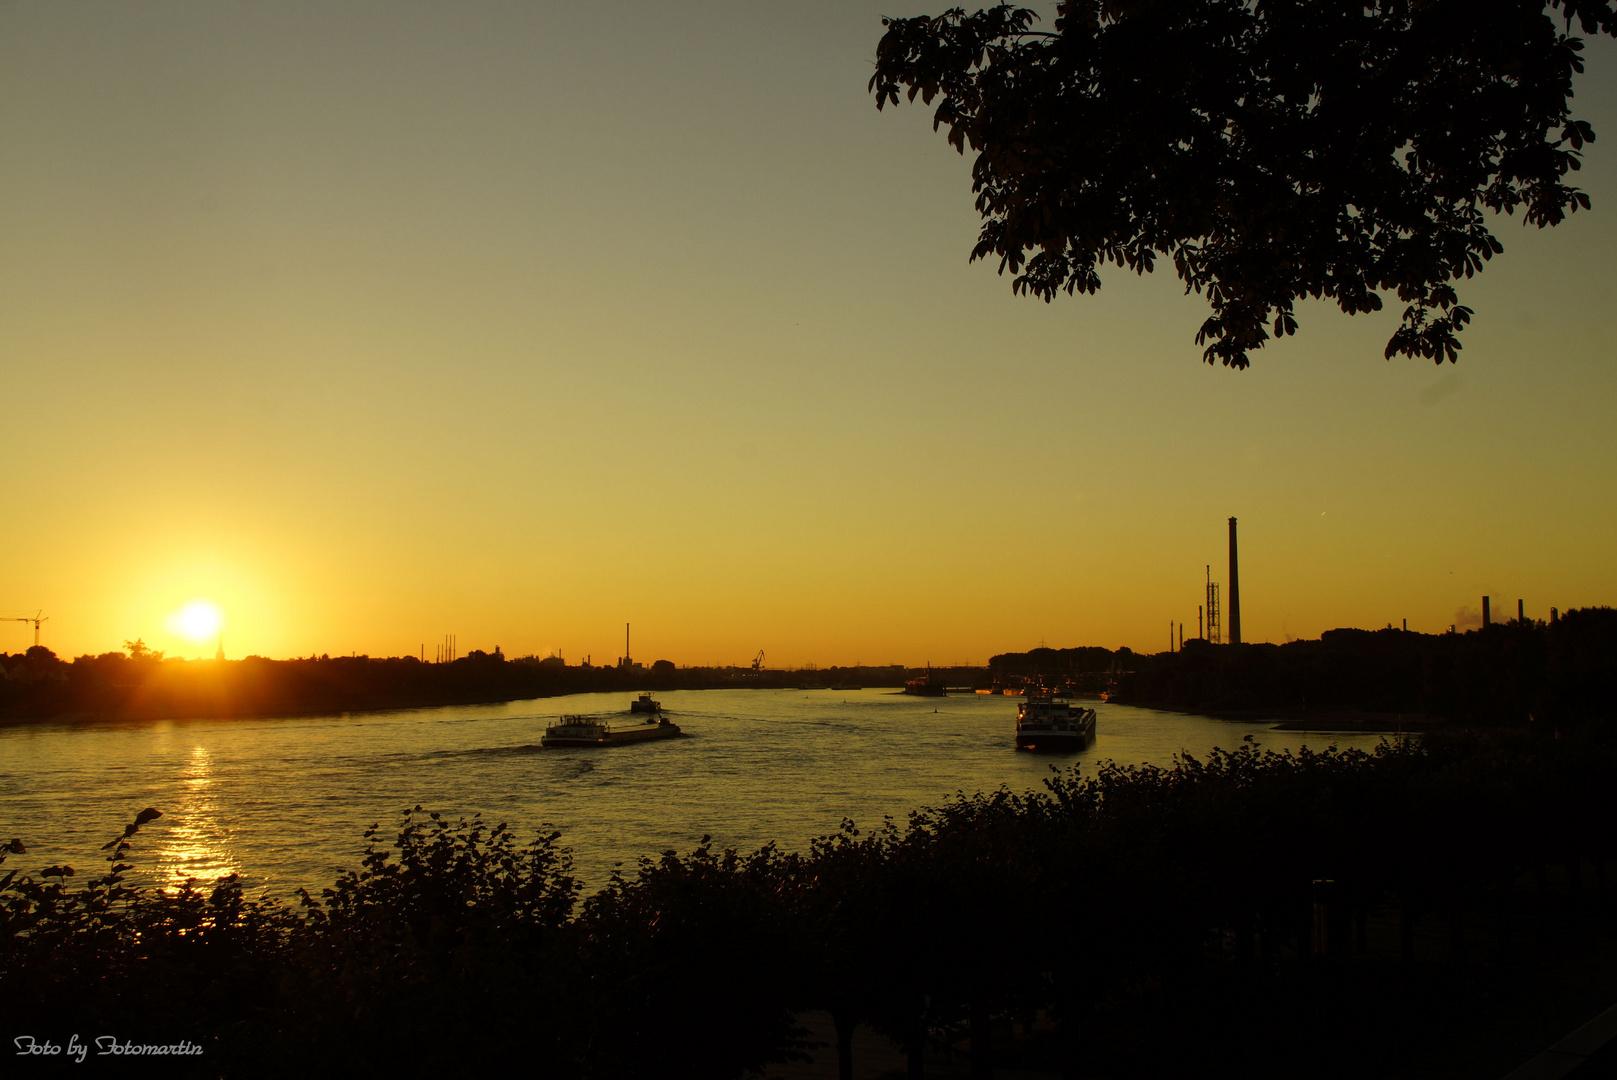 Der Rhein im Sonnenaufgang